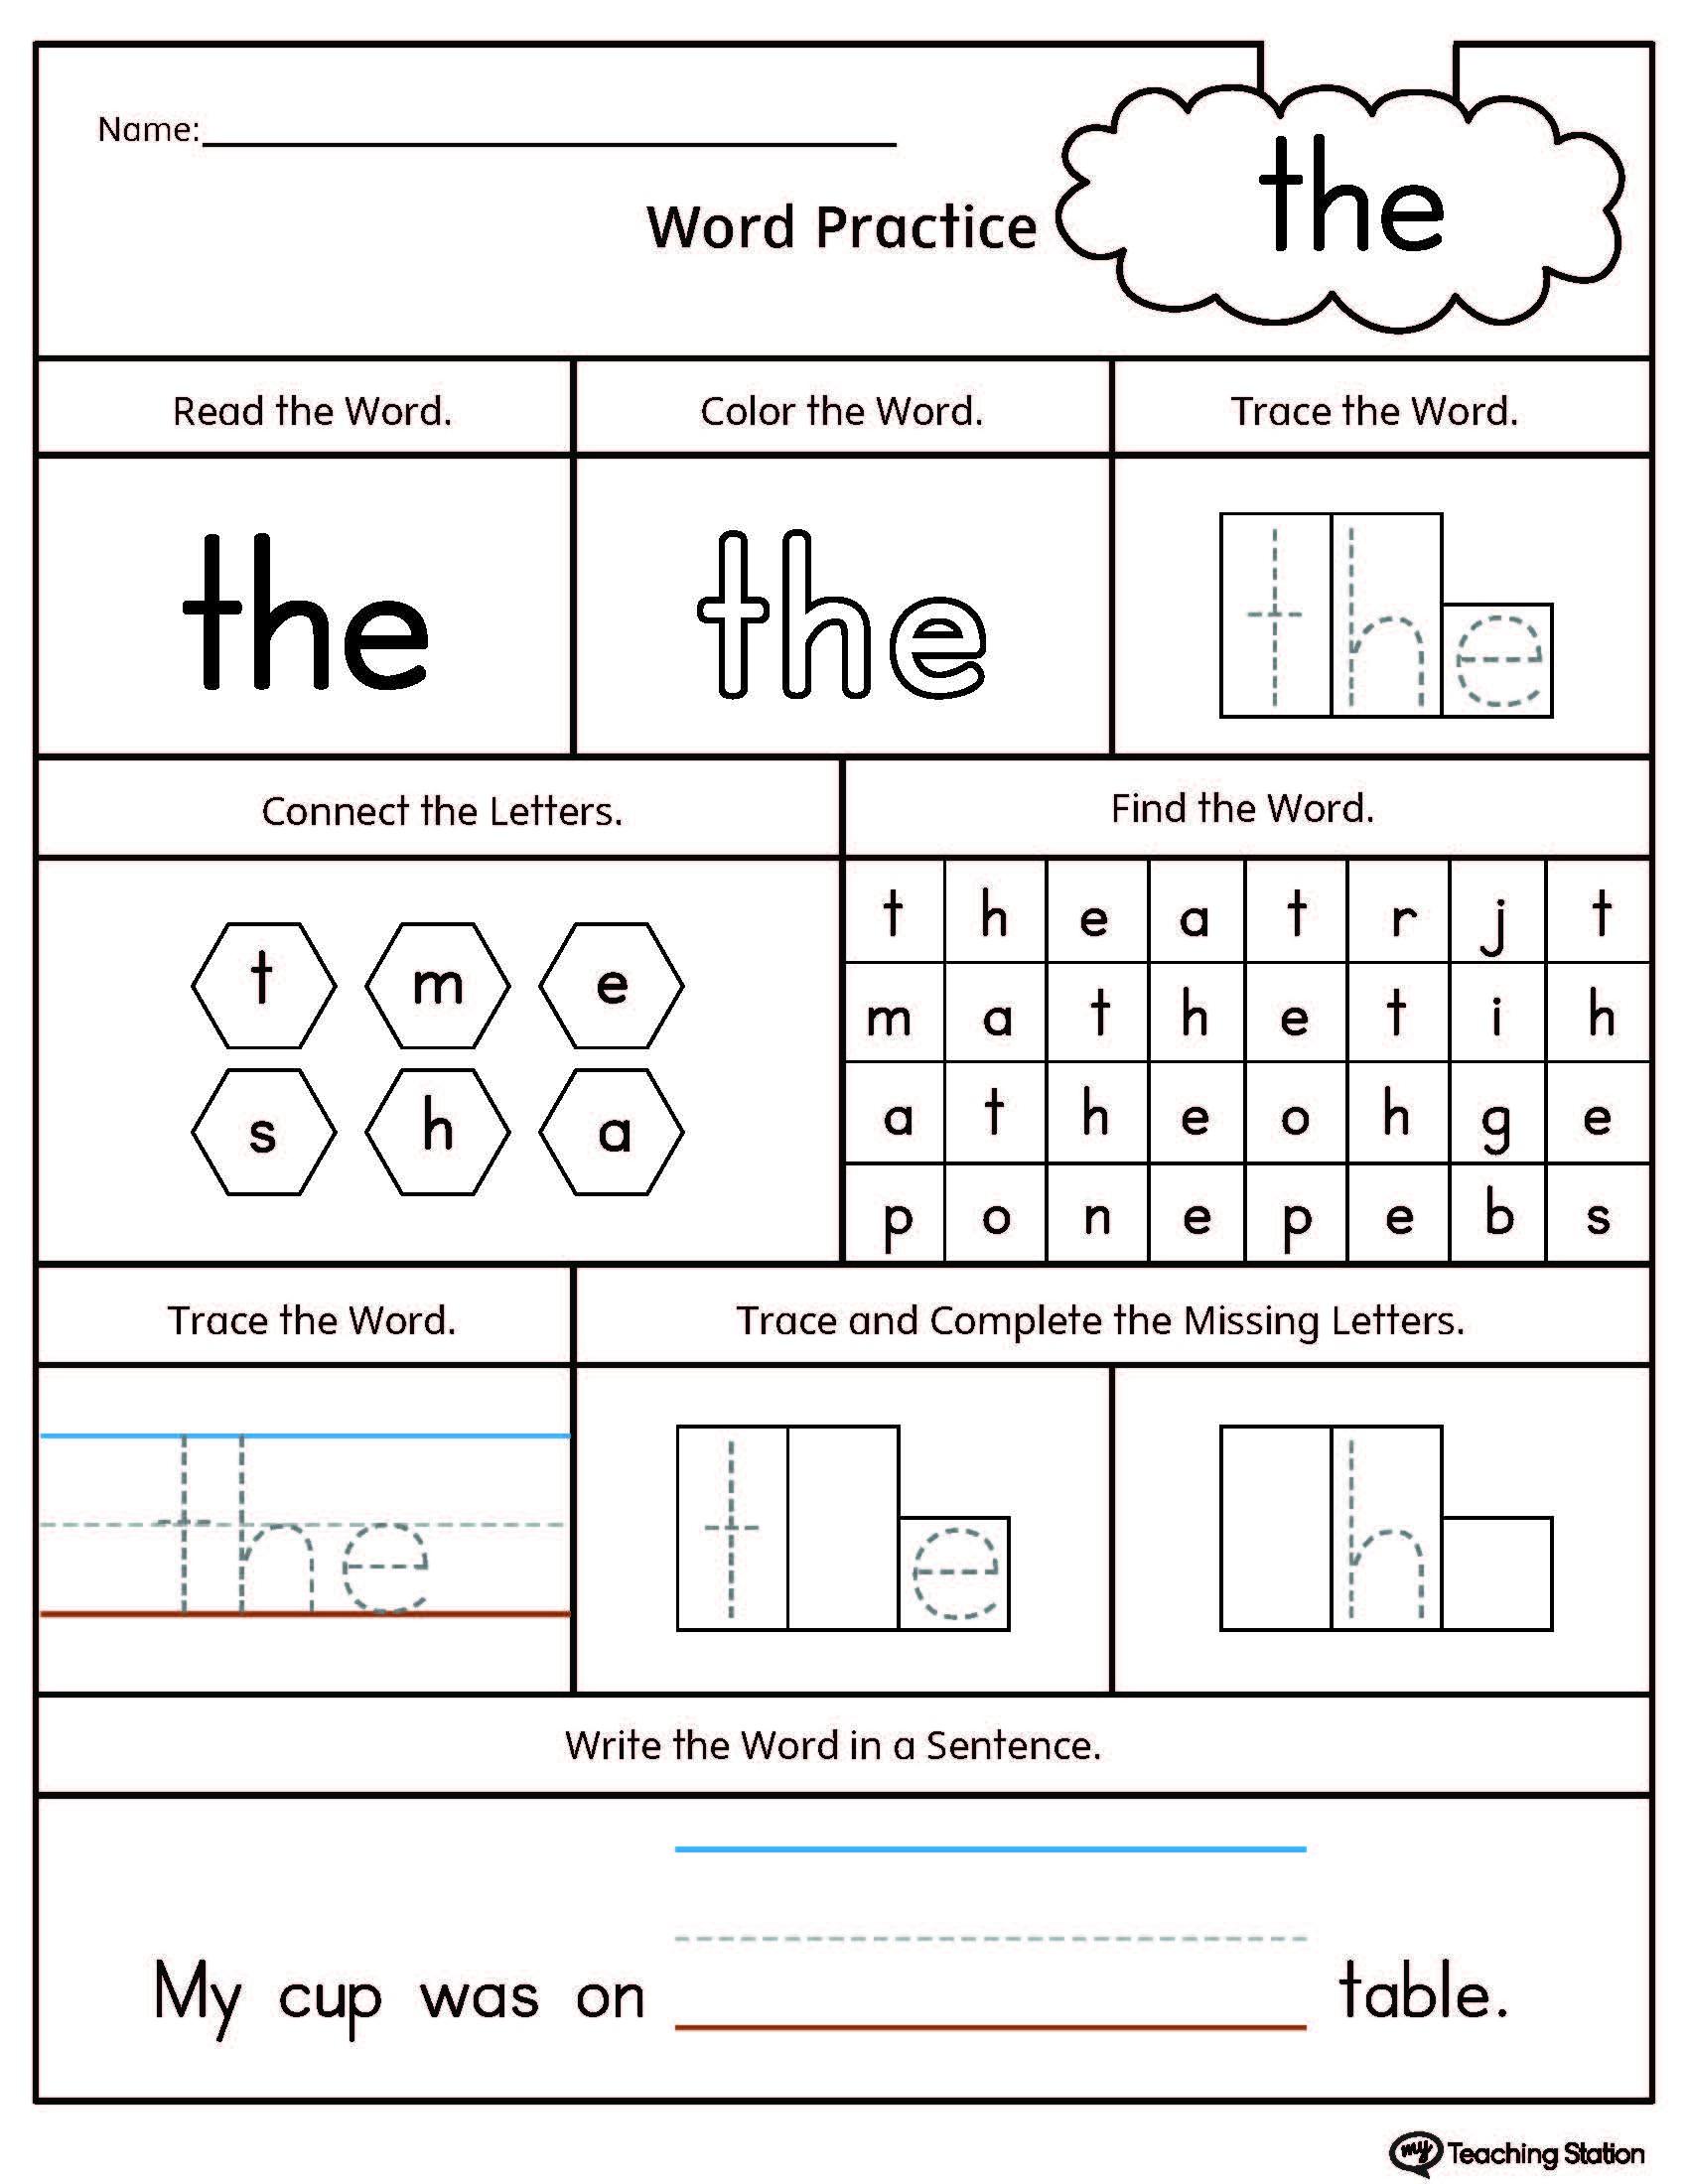 Free Printable Sight Word Worksheets